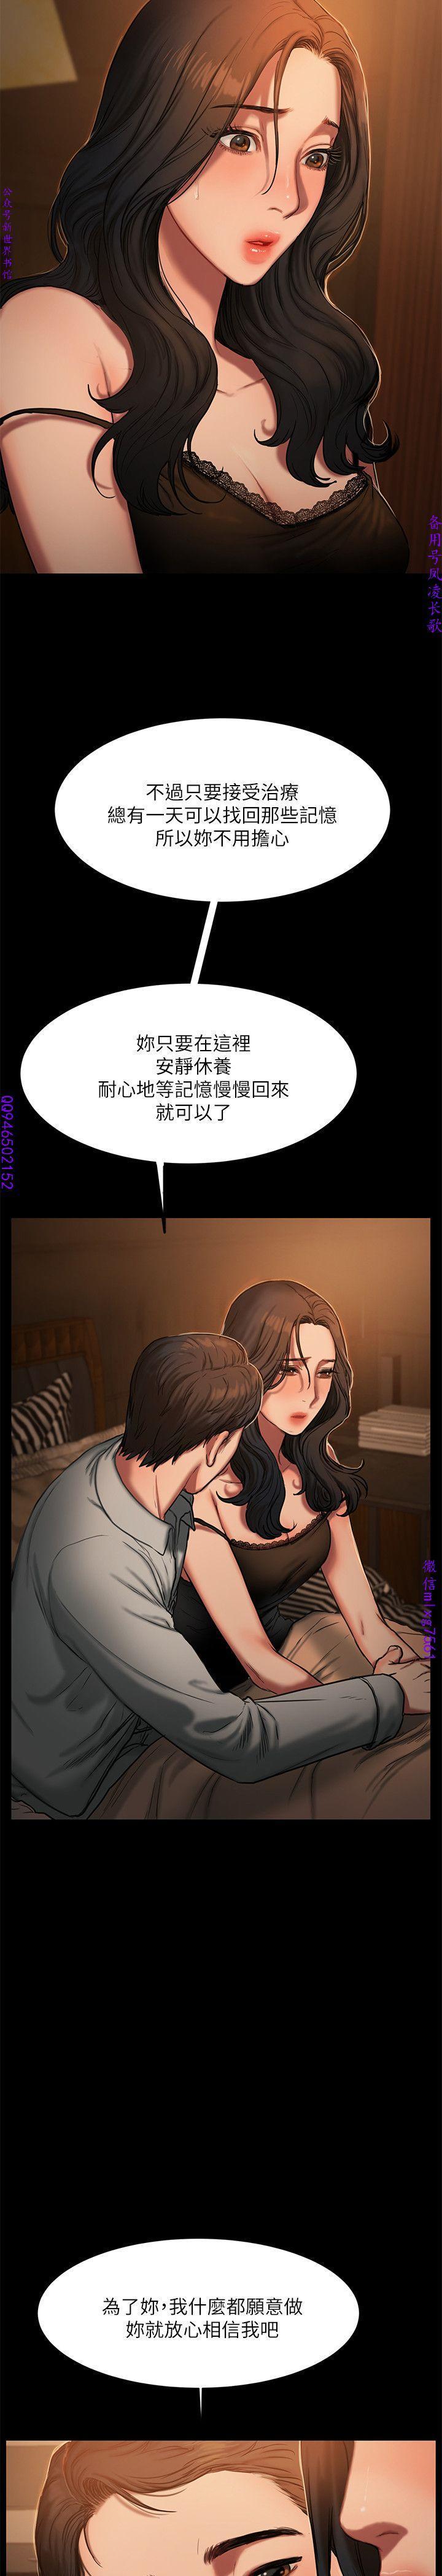 Run away 1-10【中文】 86